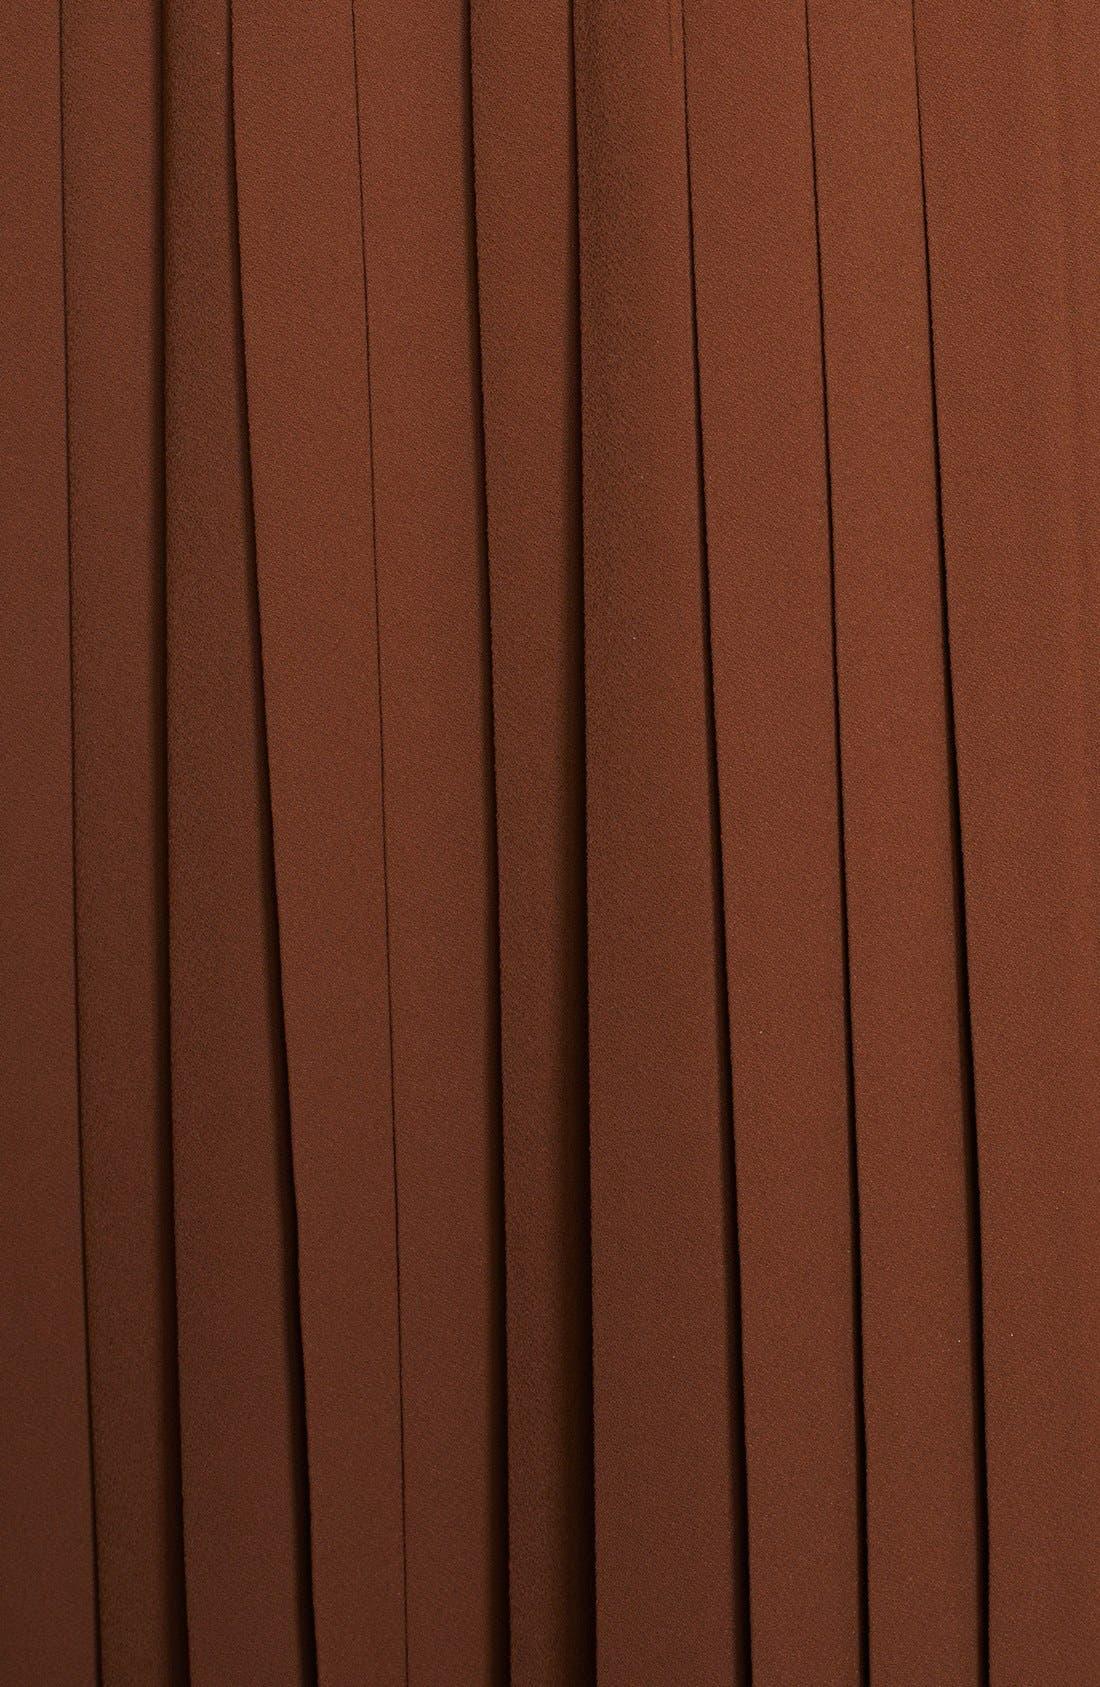 Alternate Image 3  - Michael Kors Leather Belted Pleat Dress